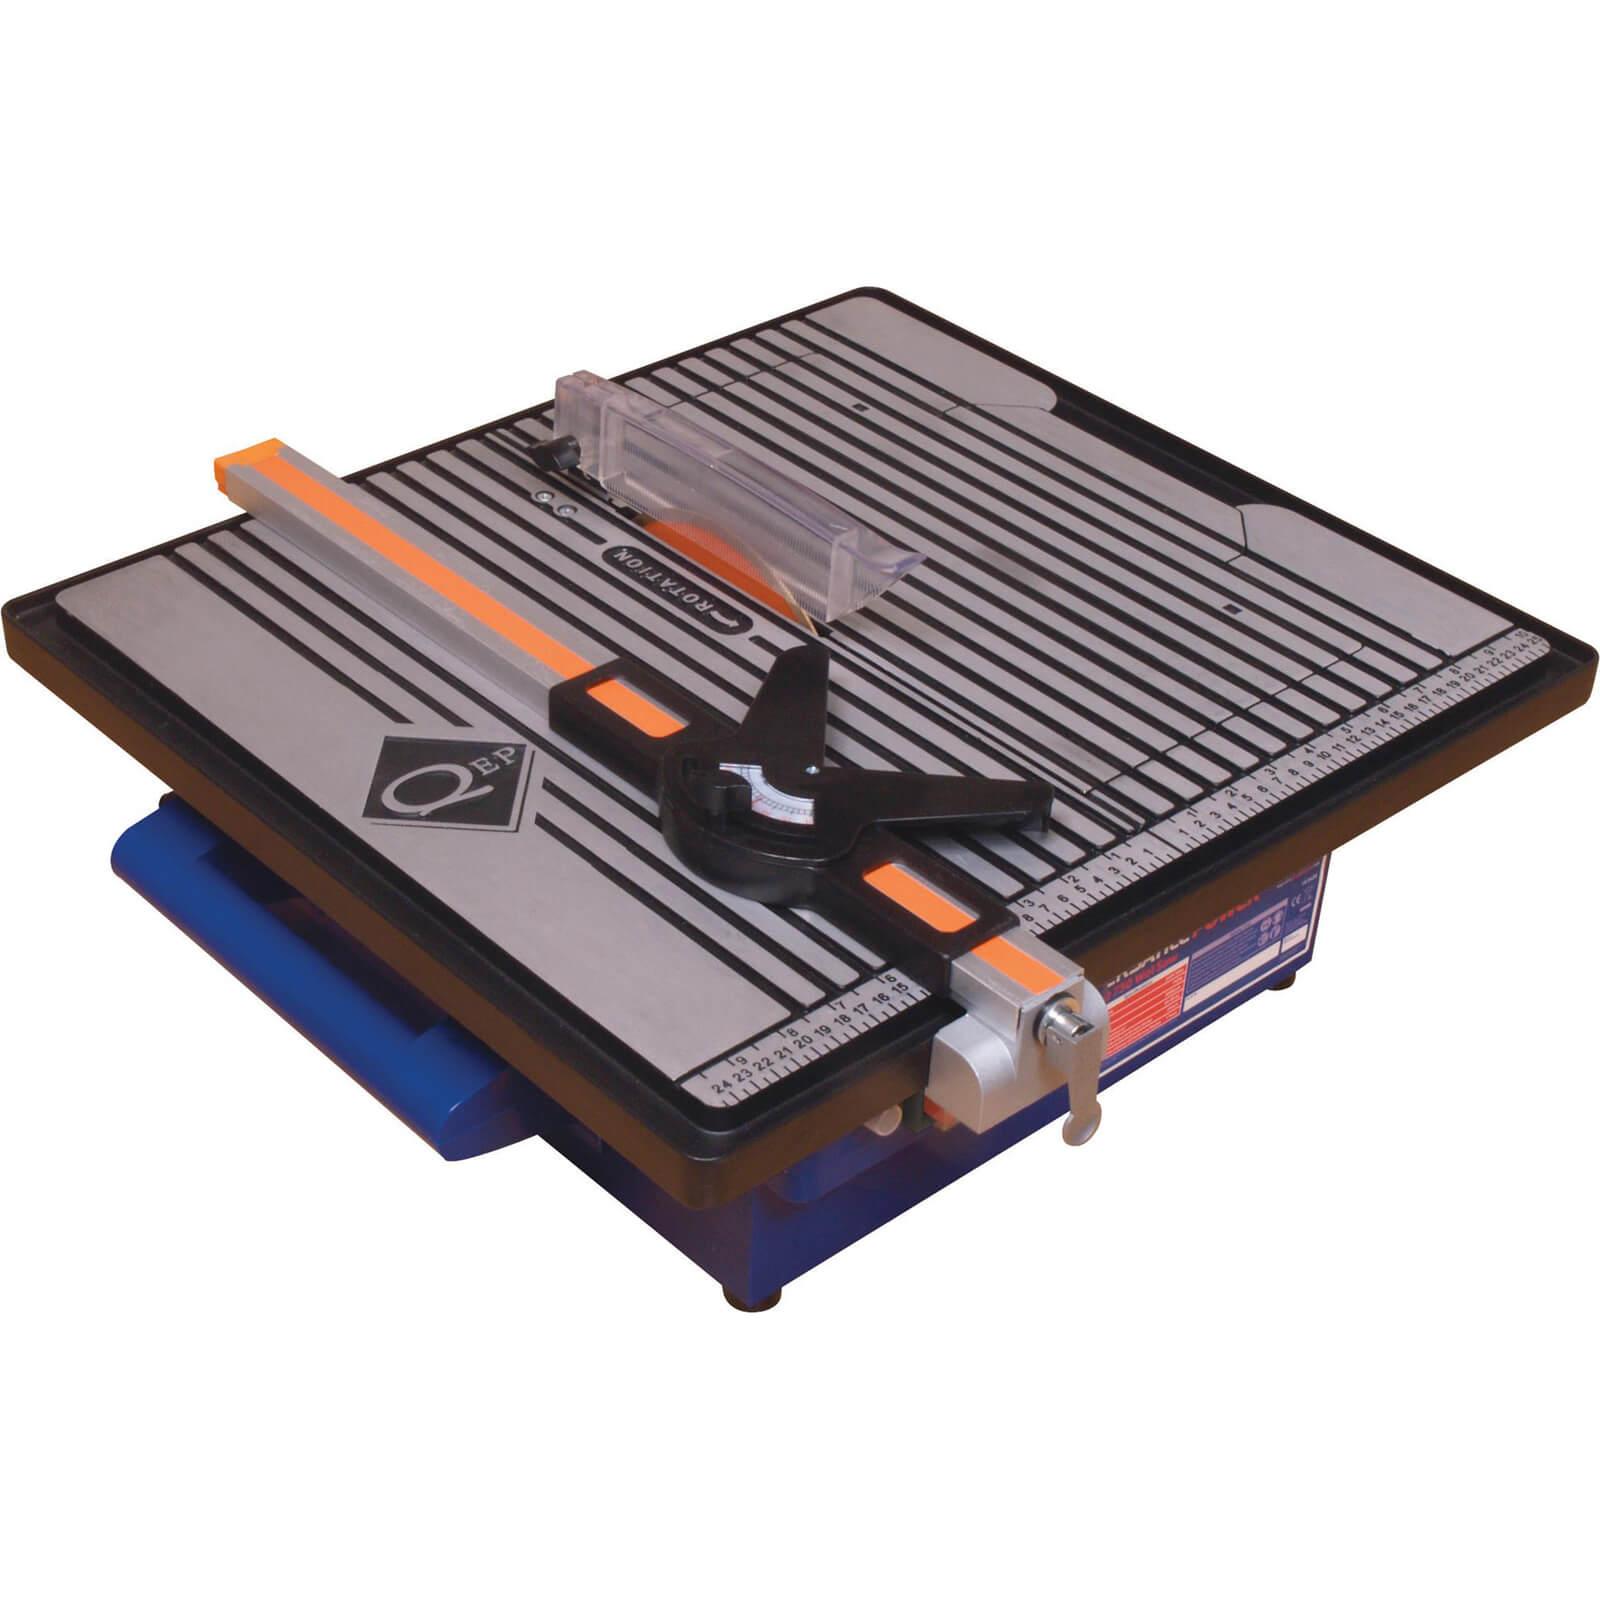 Vitrex Versatile Power Pro 750 Wet Tile Saw 180mm Diamond Blade 750w 240v